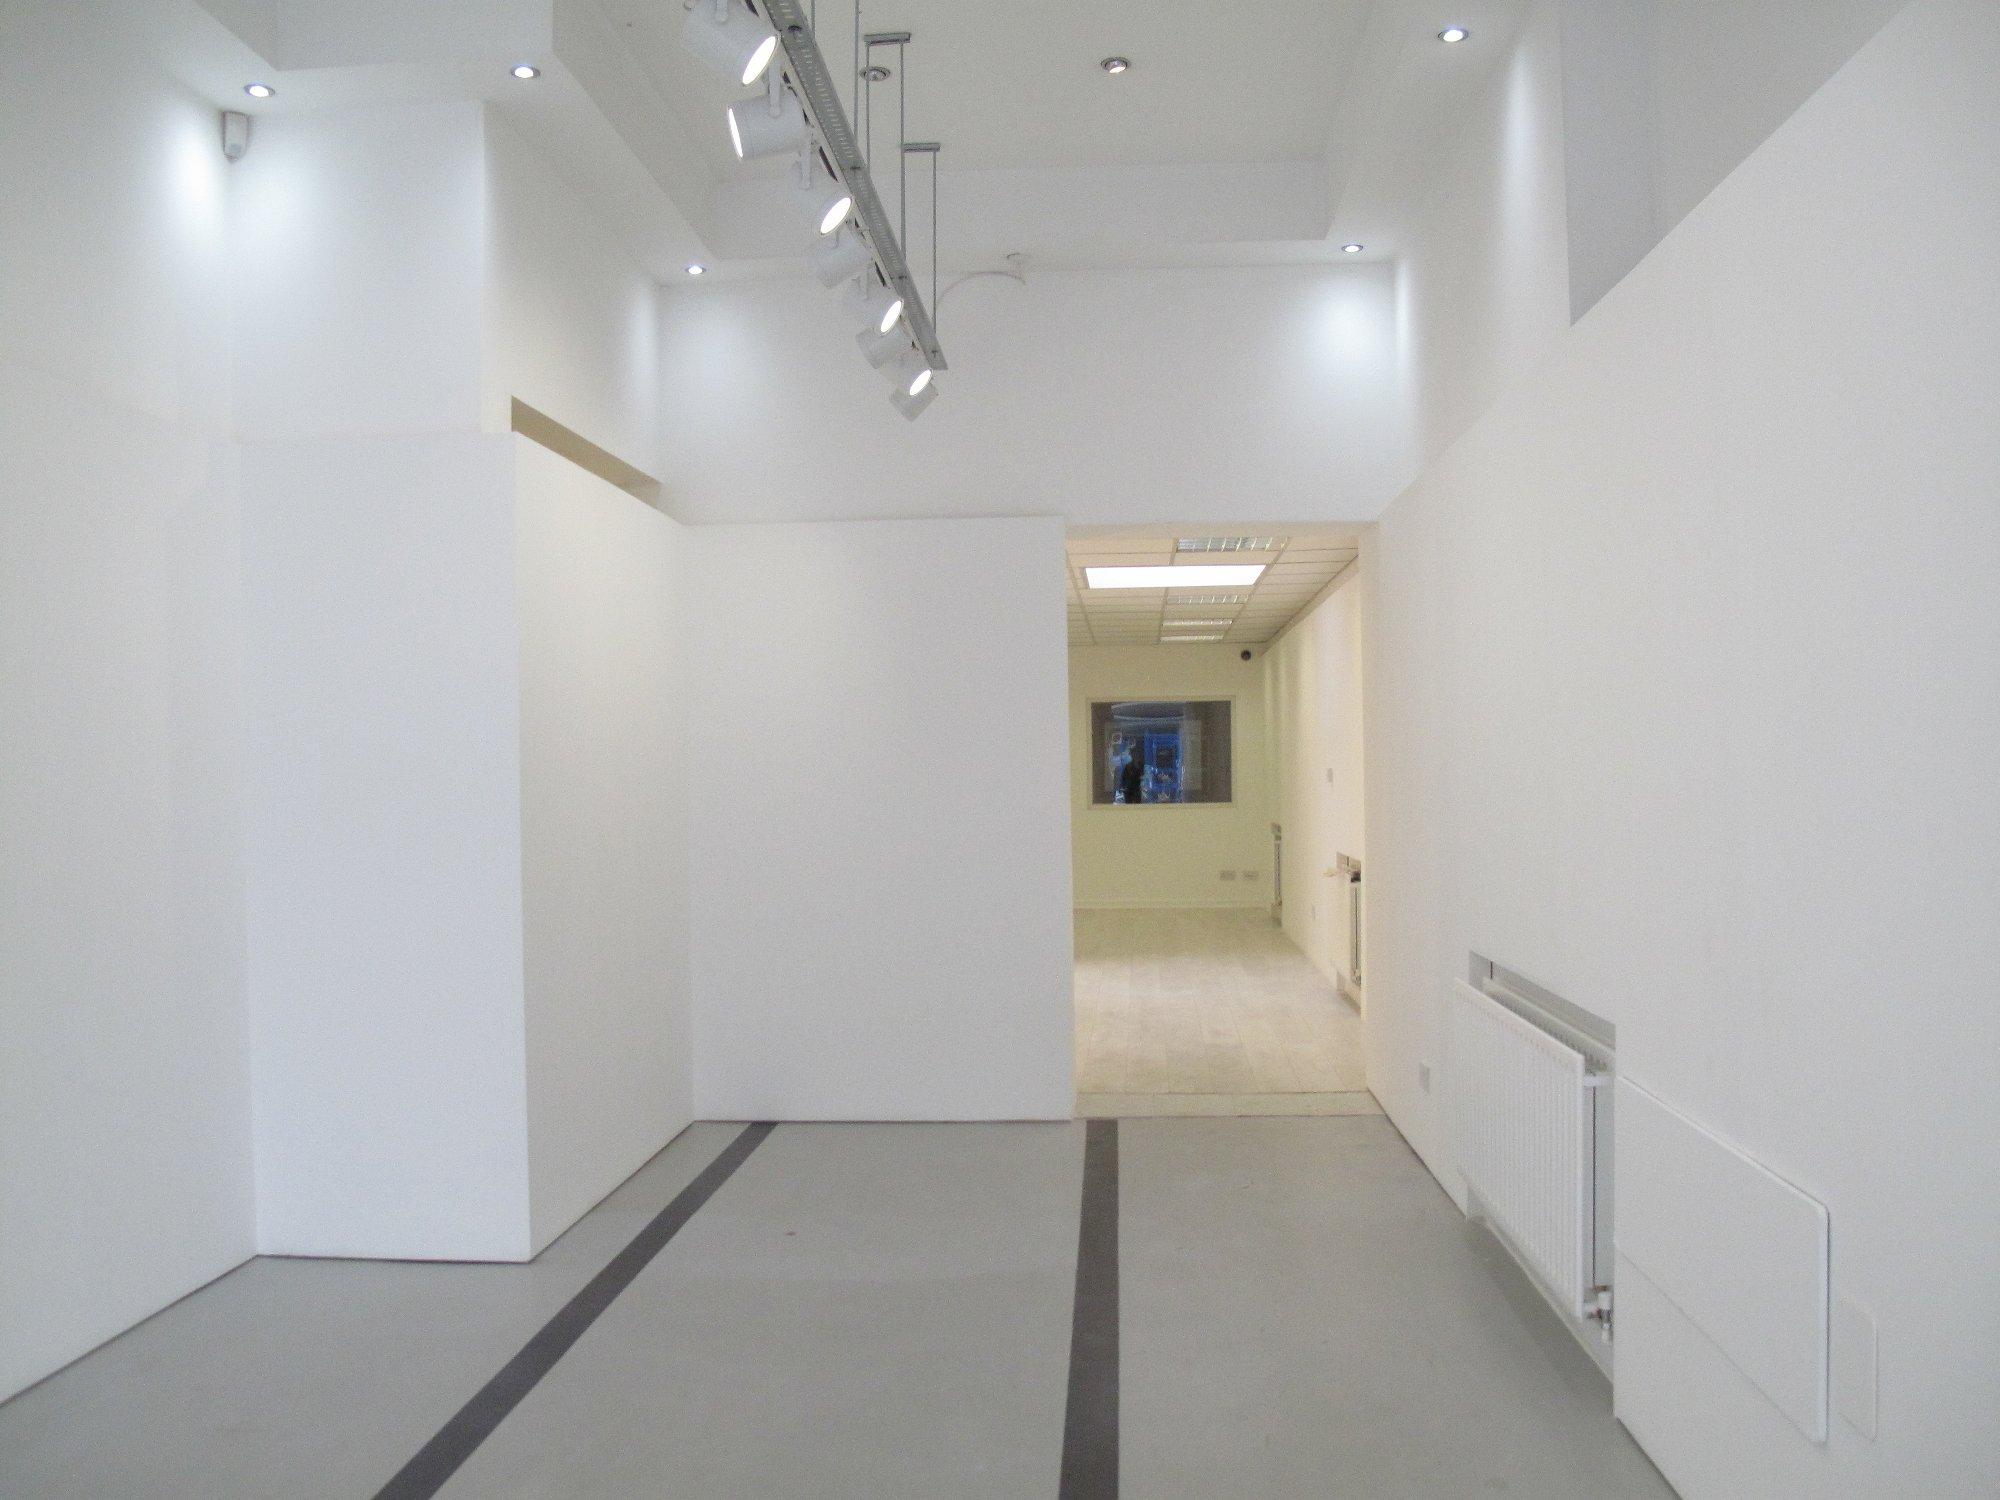 04 - Offshoot Gallery - Front.JPG